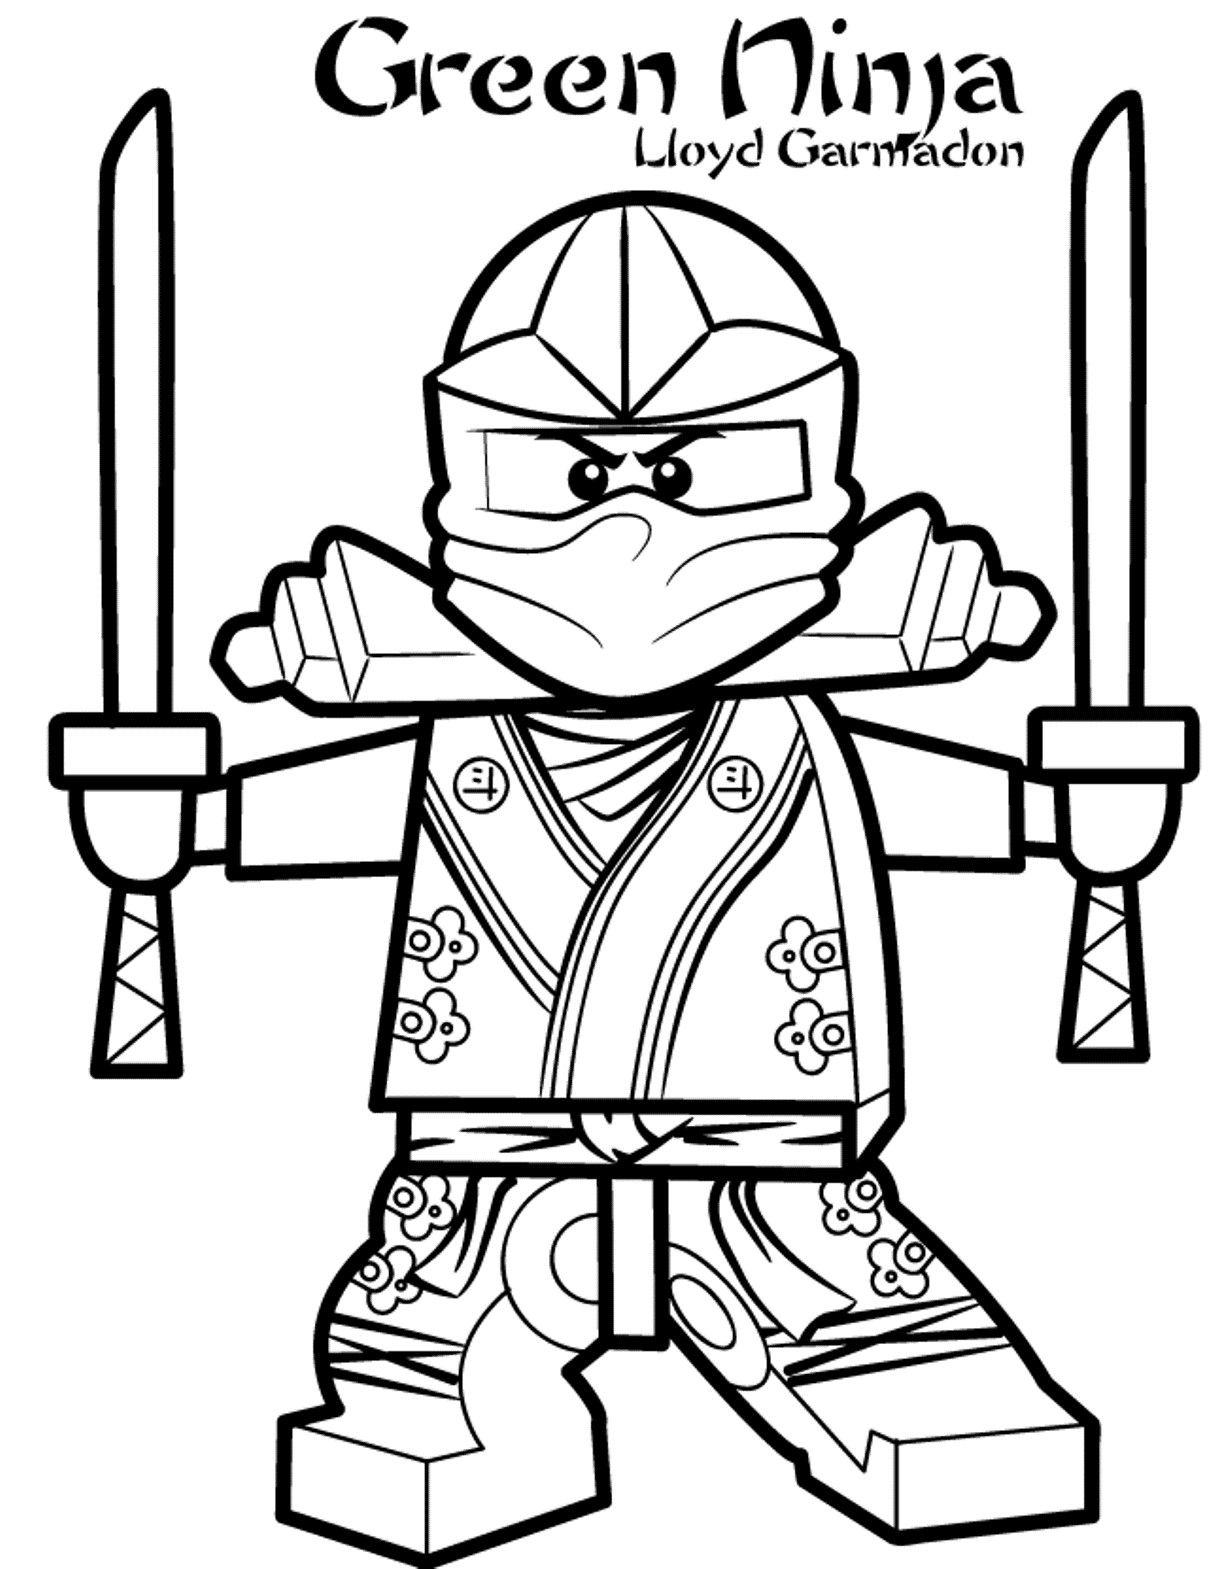 Beste 20 Ninja Ausmalbilder Beste Wohnkultur Bastelideen Coloring Und Frisur Inspiration Ninjago Ausmalbilder Ausmalbilder Schildkrote Superhelden Malvorlagen